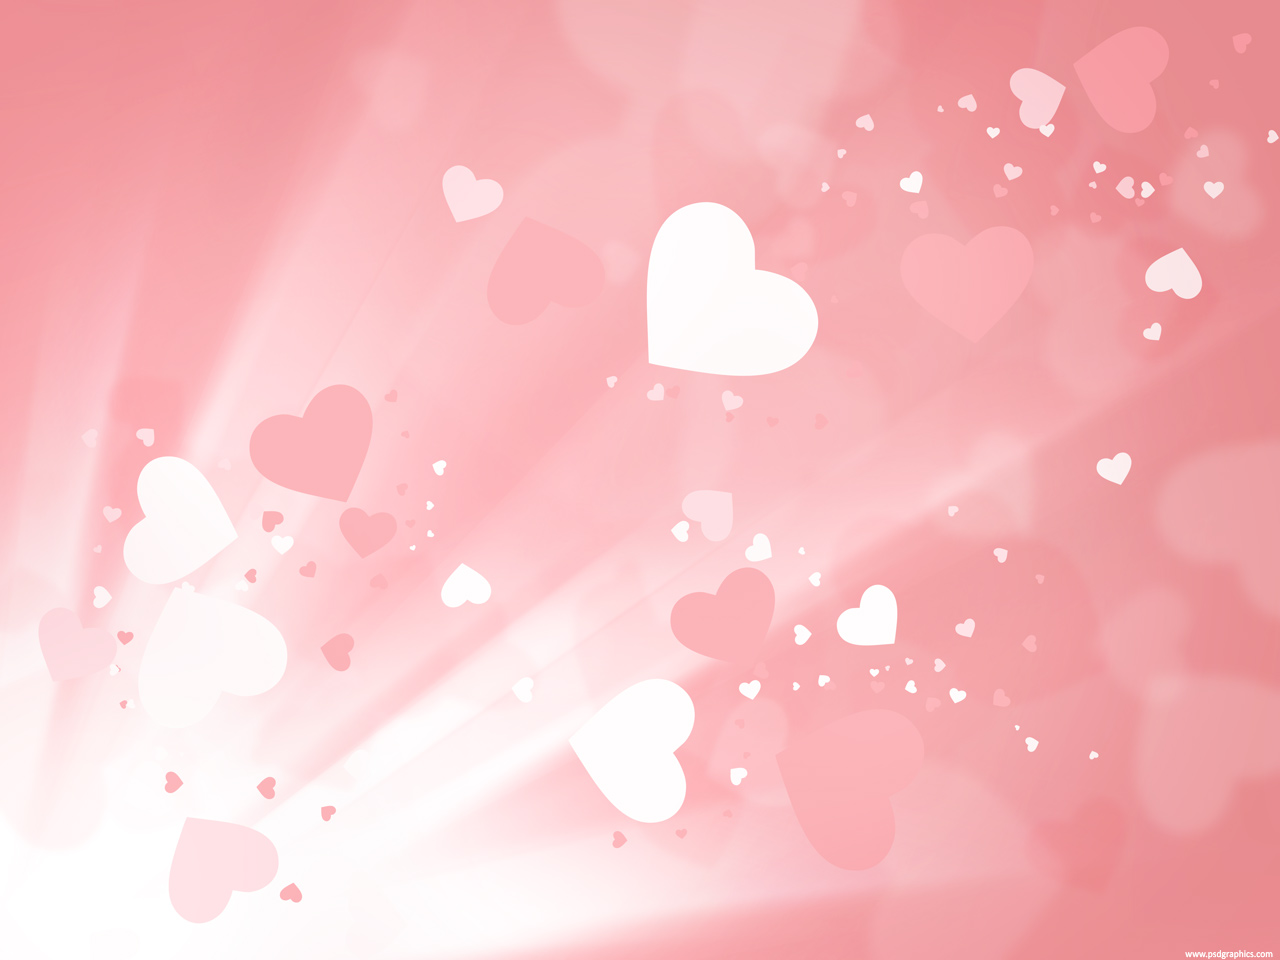 Valentines Day Background 2015 Wallpaper 12406 Wallpaper computer 1280x960